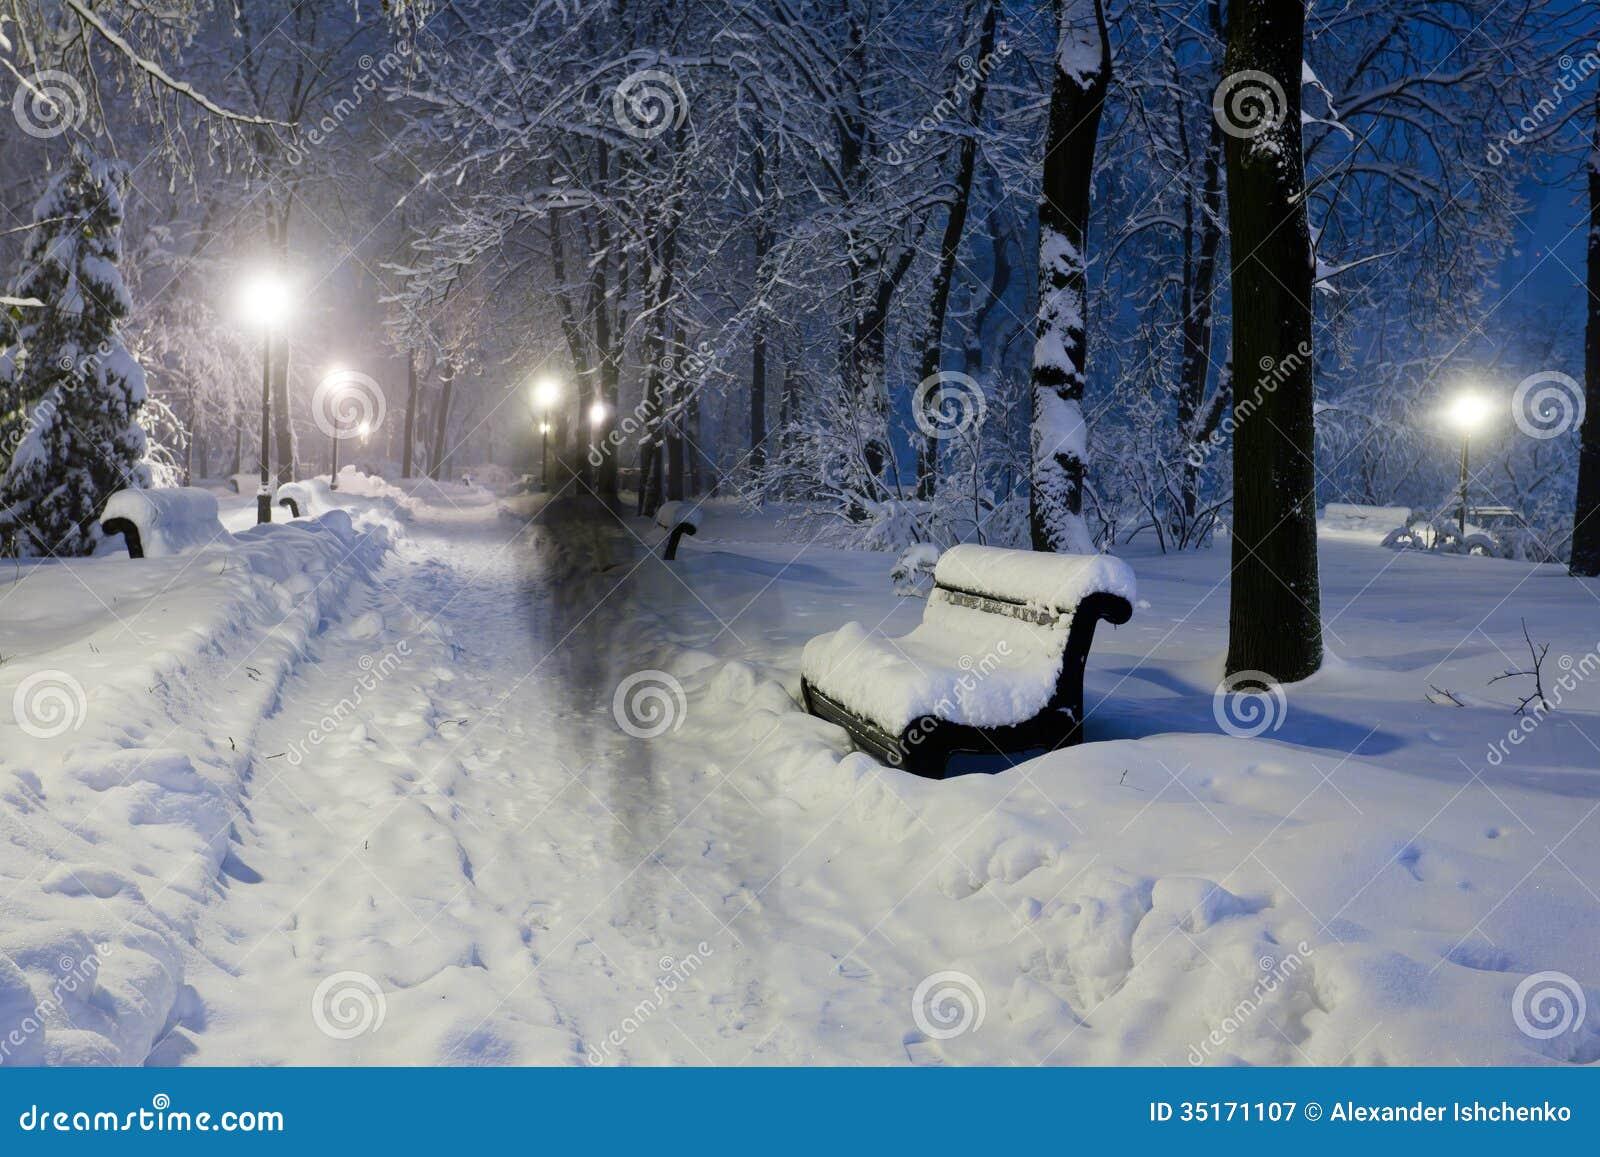 download snow at the -#main